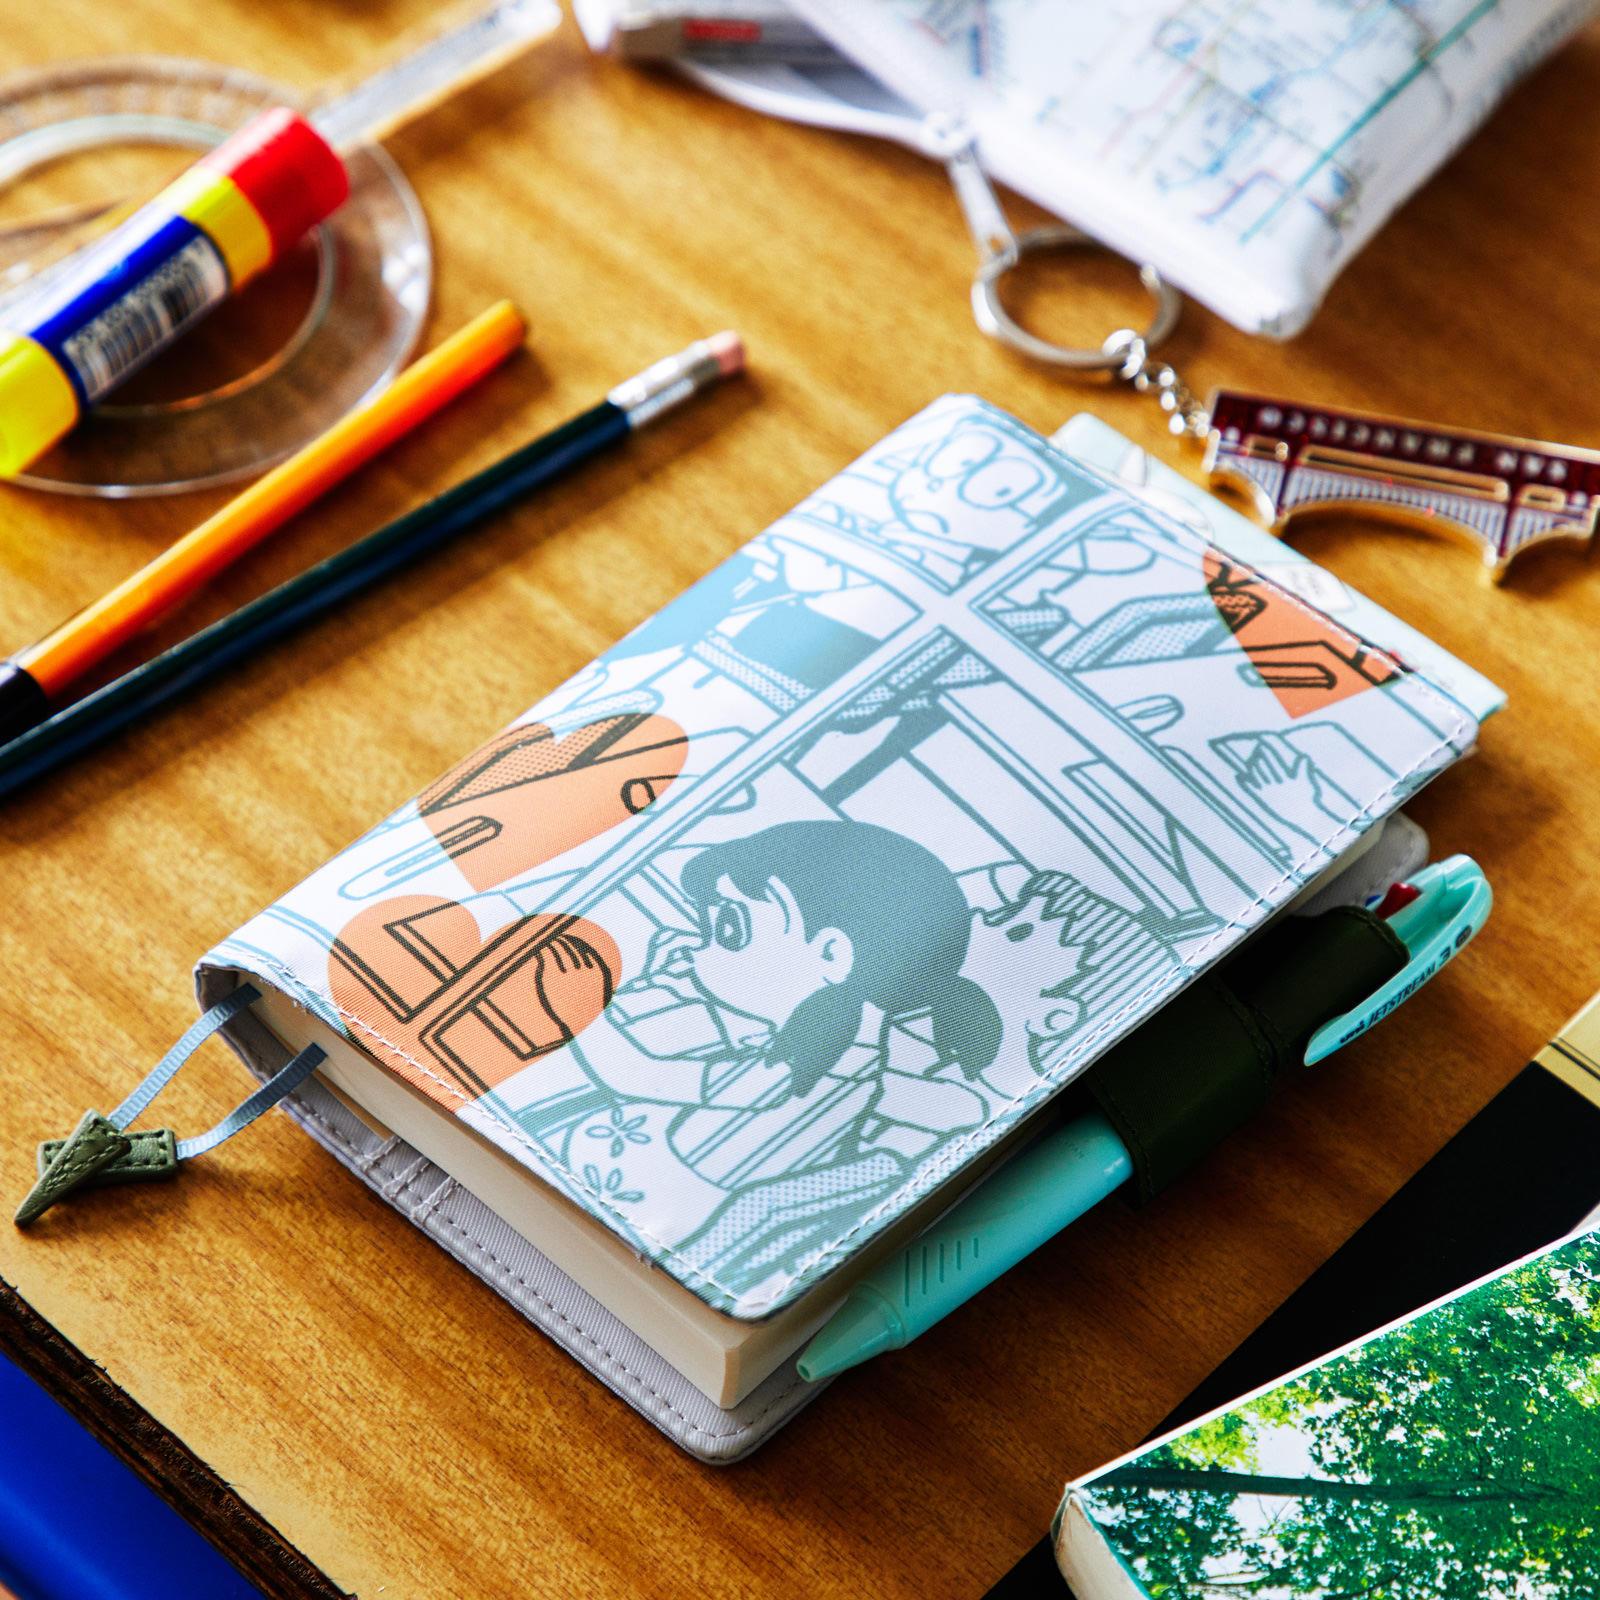 Notebook Fujio Museum ver Doraemon Hobonichi Techo 2020 weeks Fujiko F